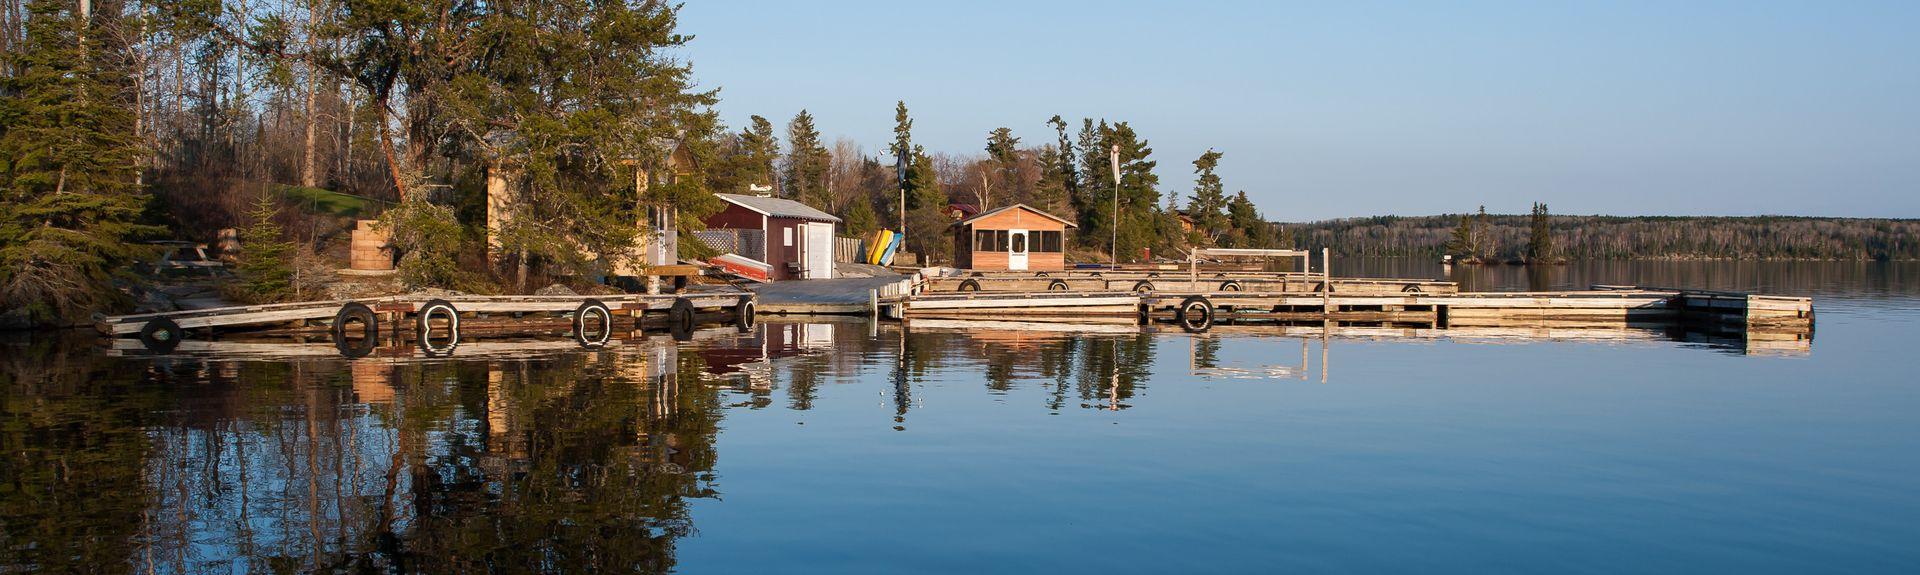 Vrbo | Kenora, ON, CA Vacation Rentals: cottage rentals & more